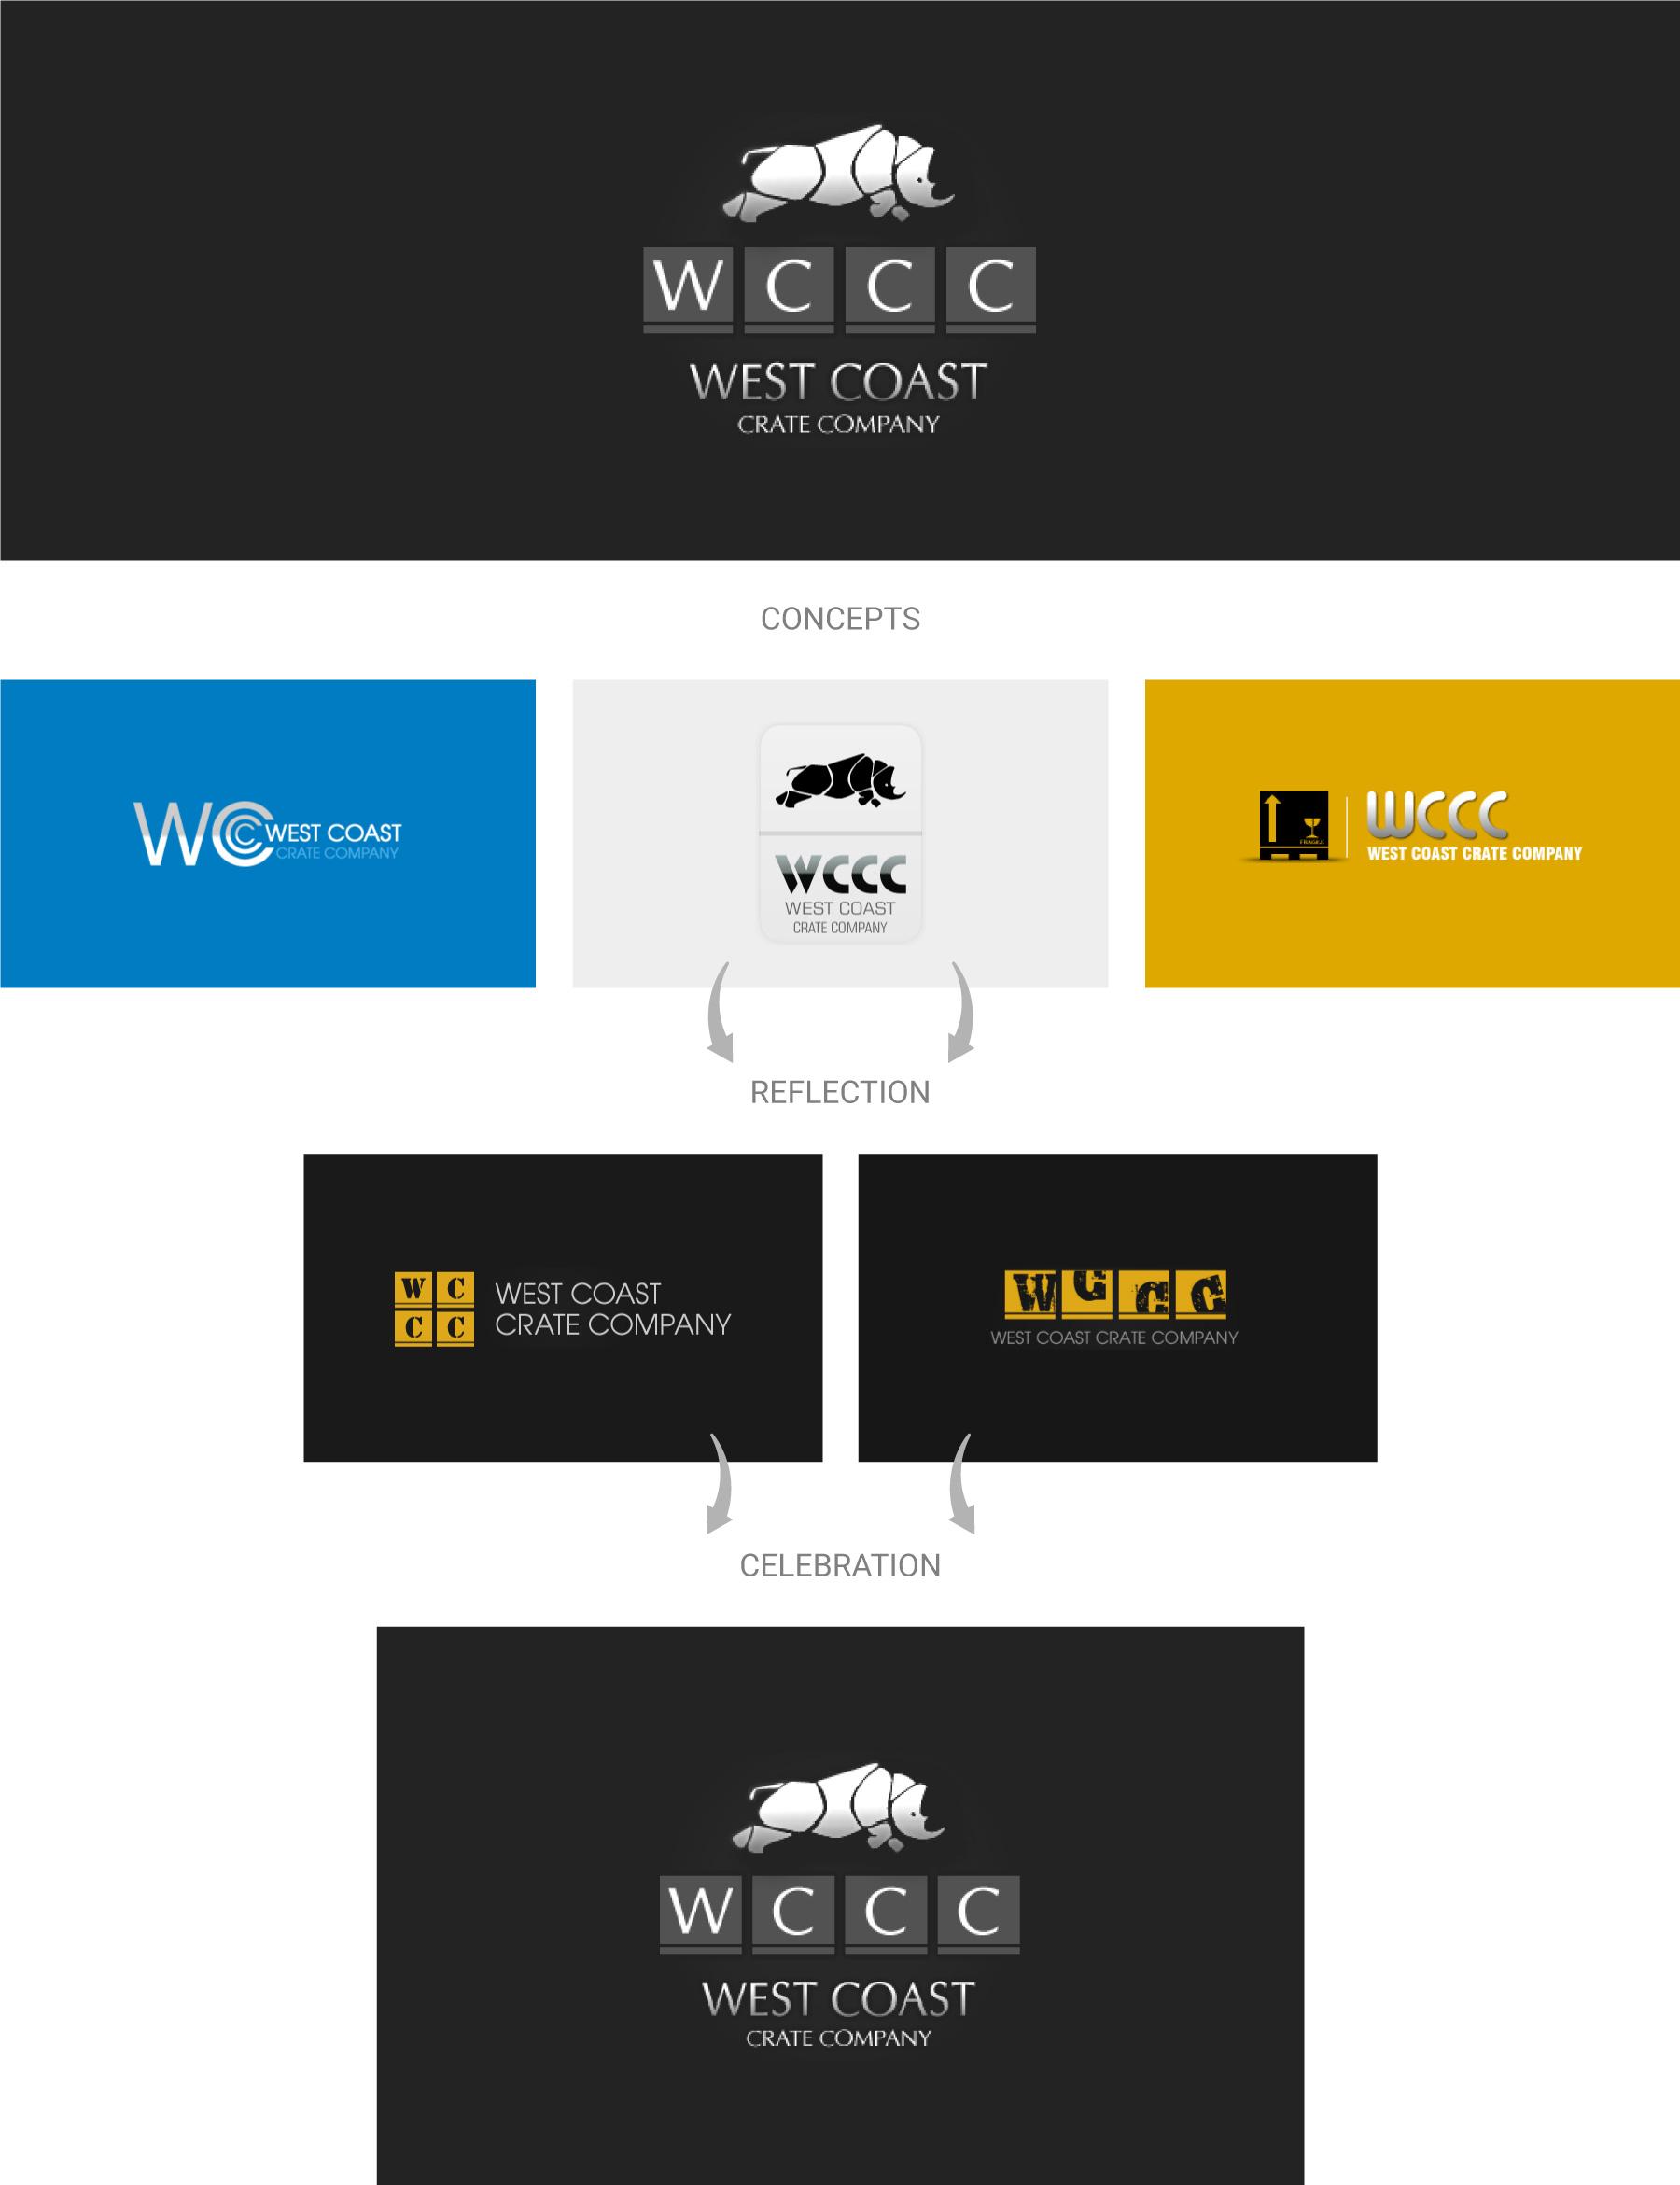 West-coast-crate-company-logo-design